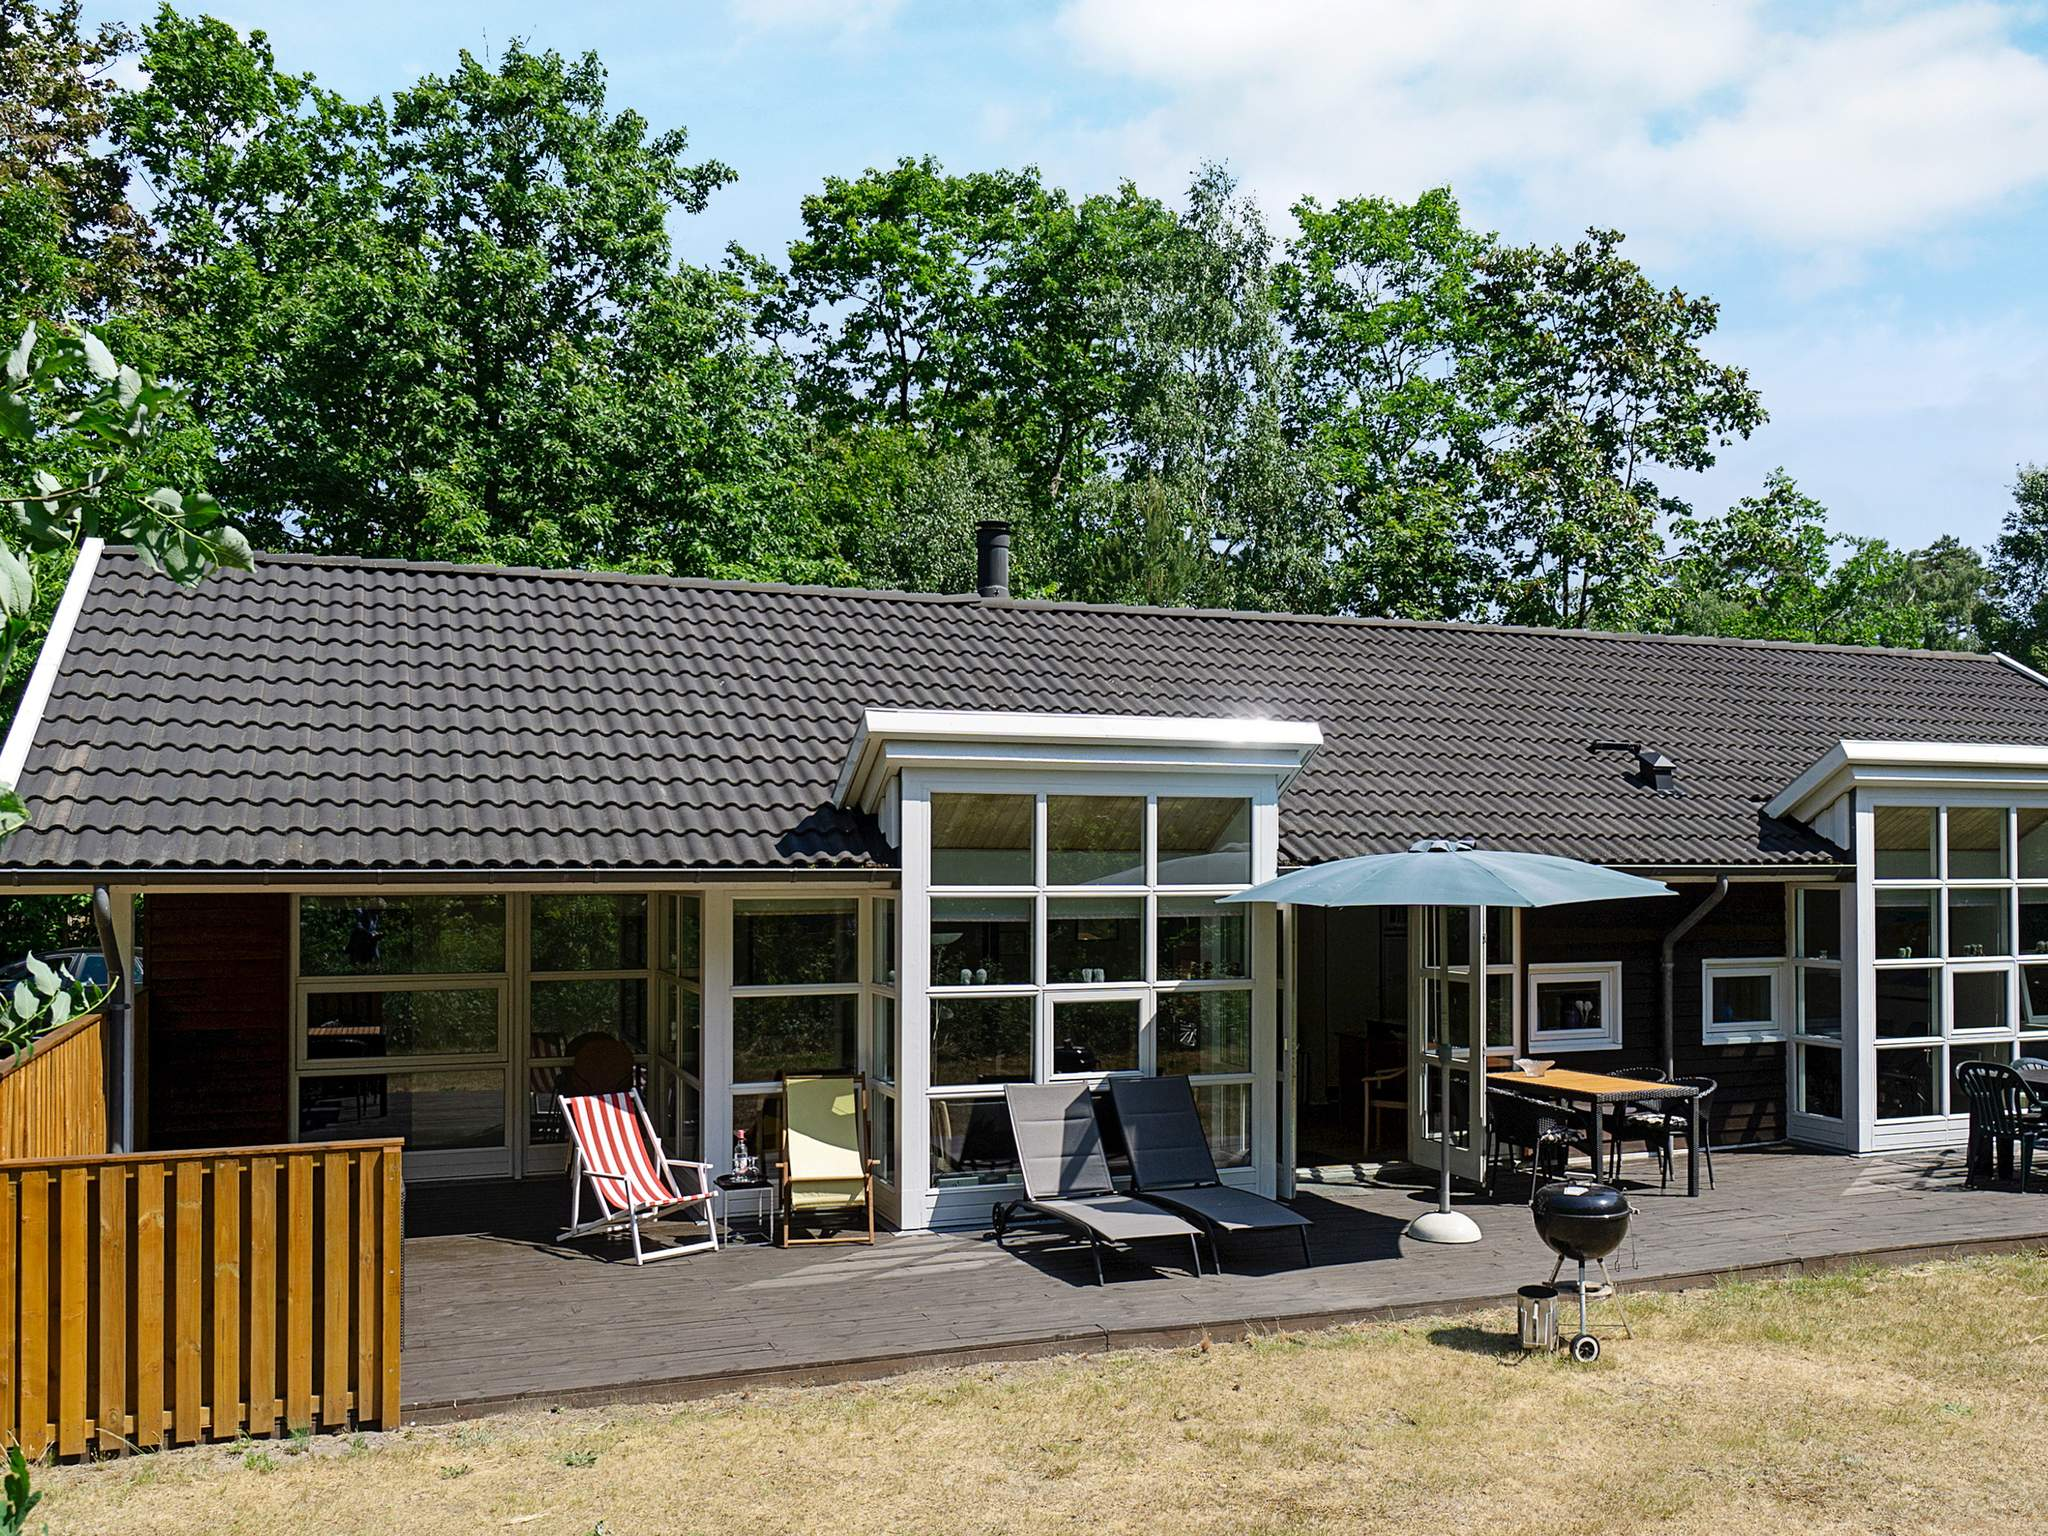 Ferienhaus Hasle (2523798), Hasle, , Bornholm, Dänemark, Bild 18